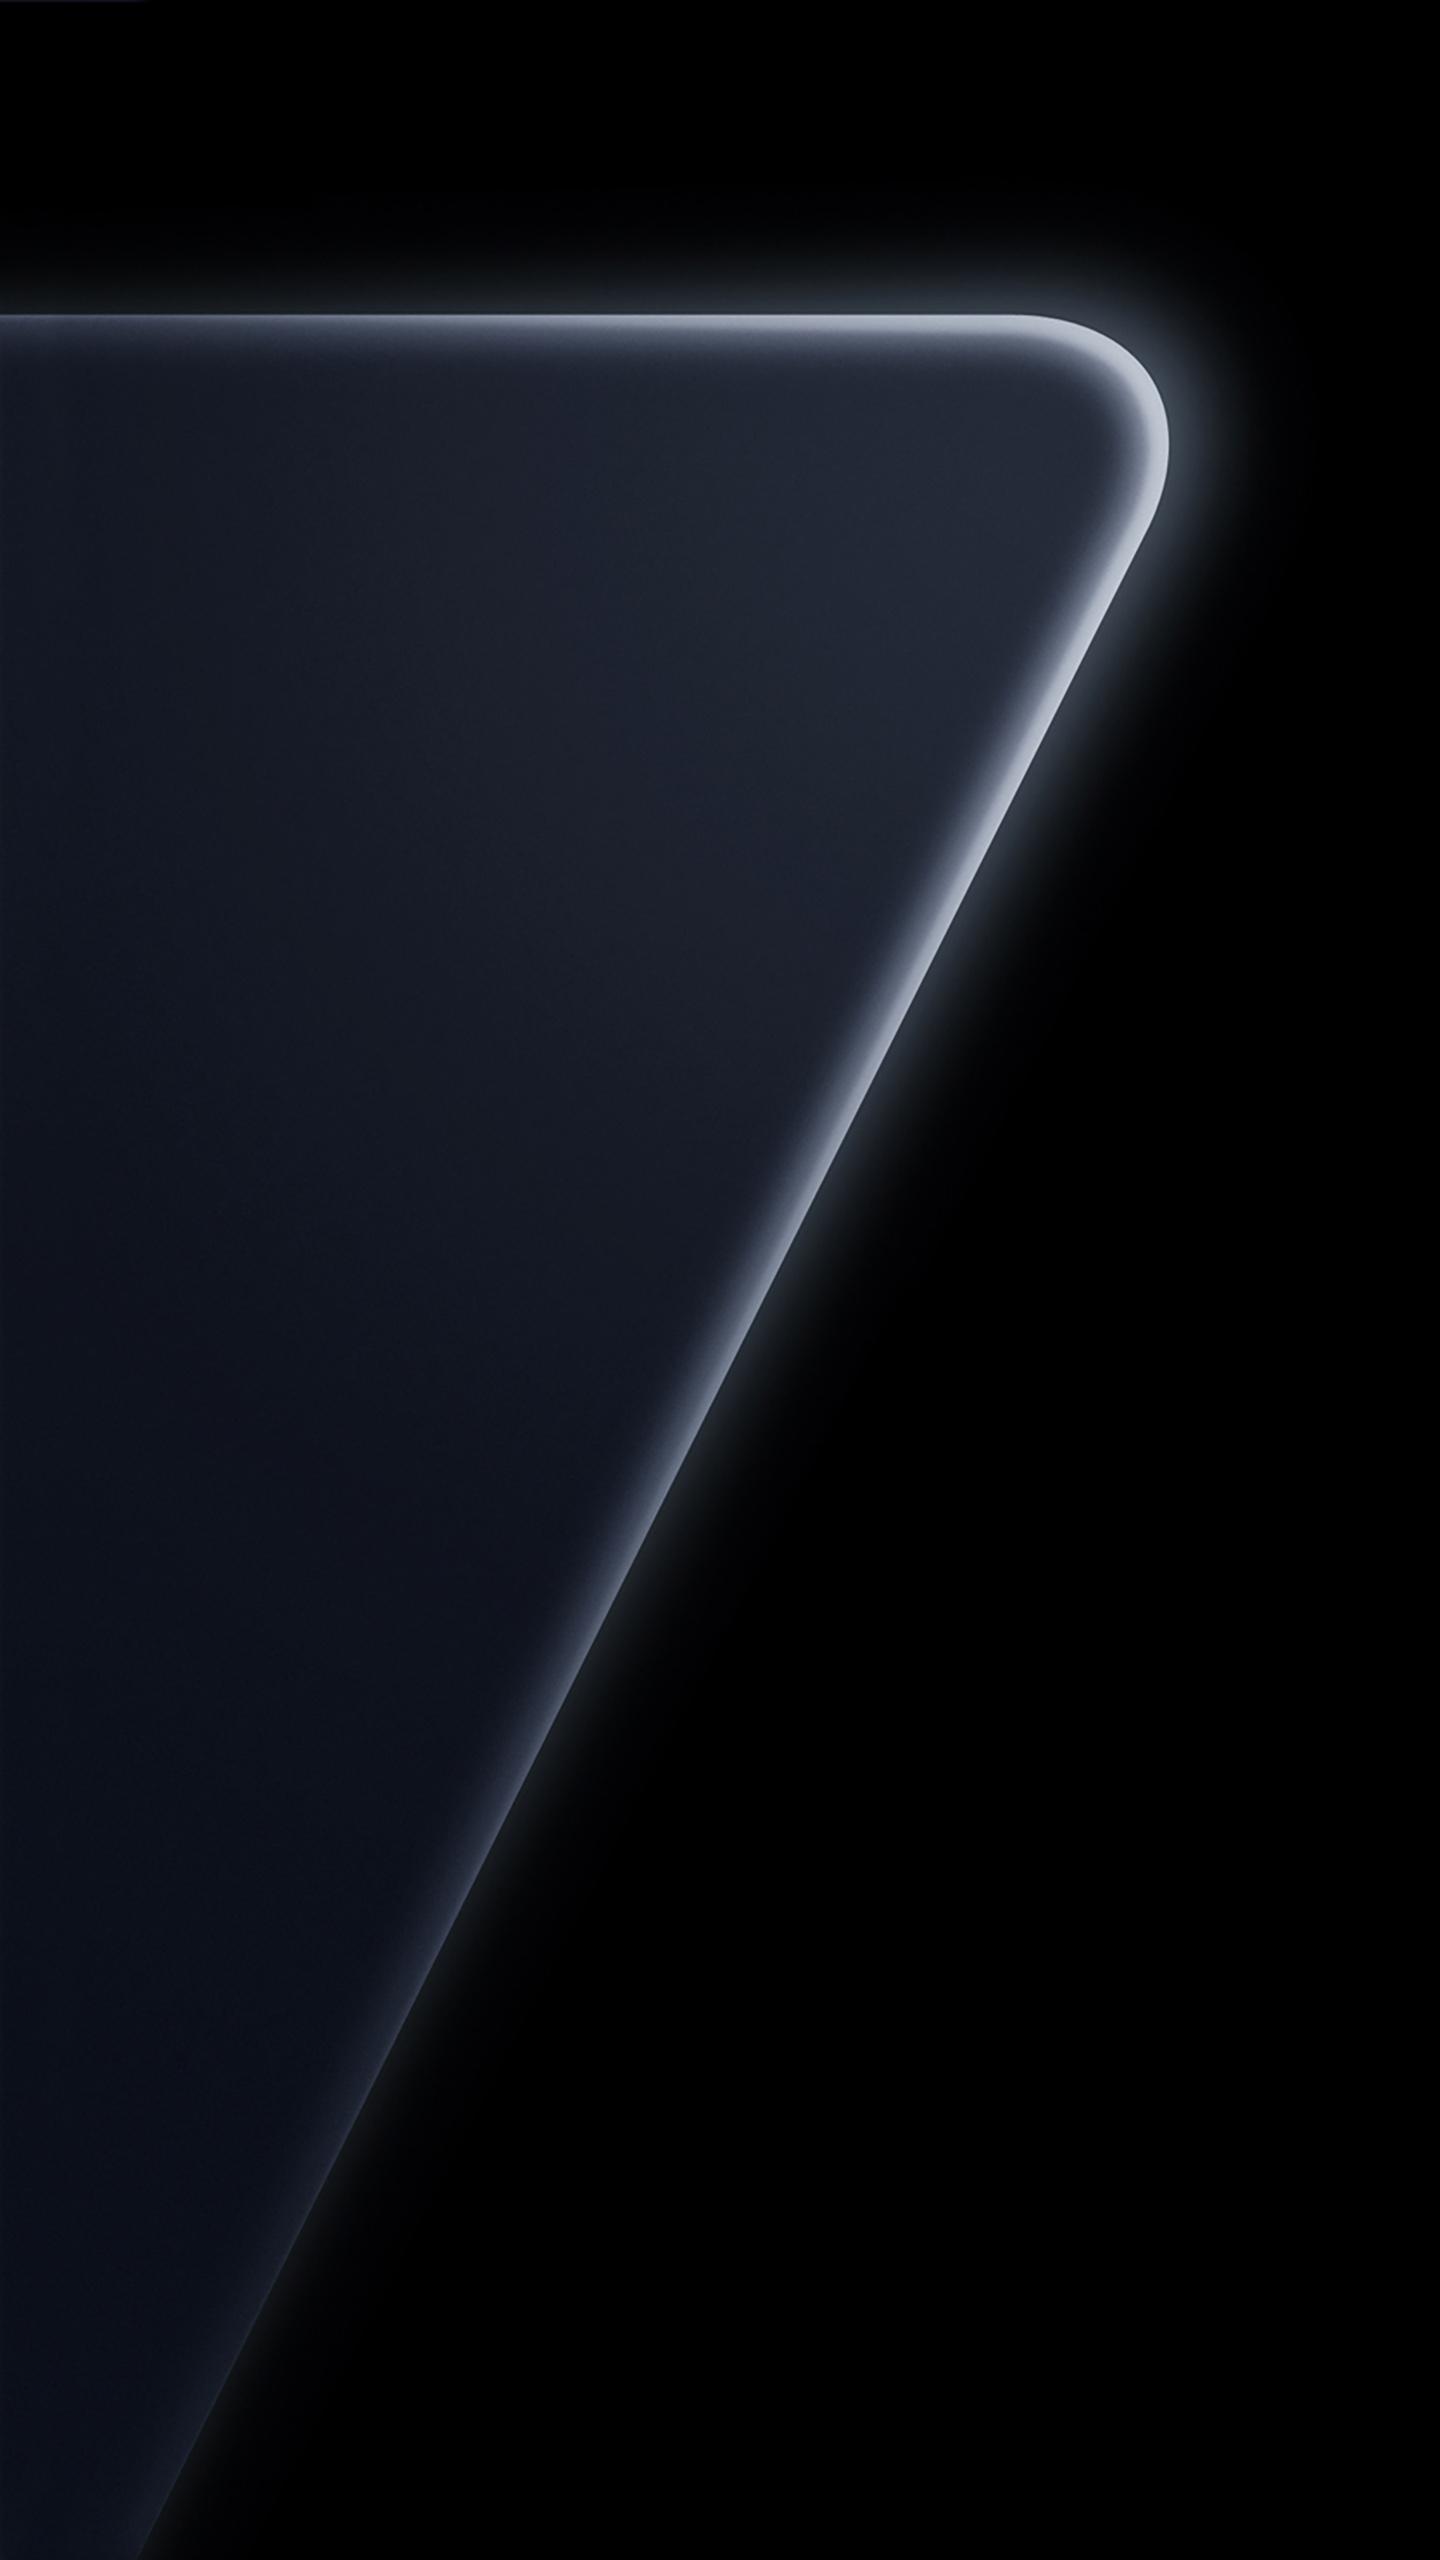 Samsung S7 Edge Wallpaper   Galaxy S7 Edge Black Pearl 2143639 1440x2560